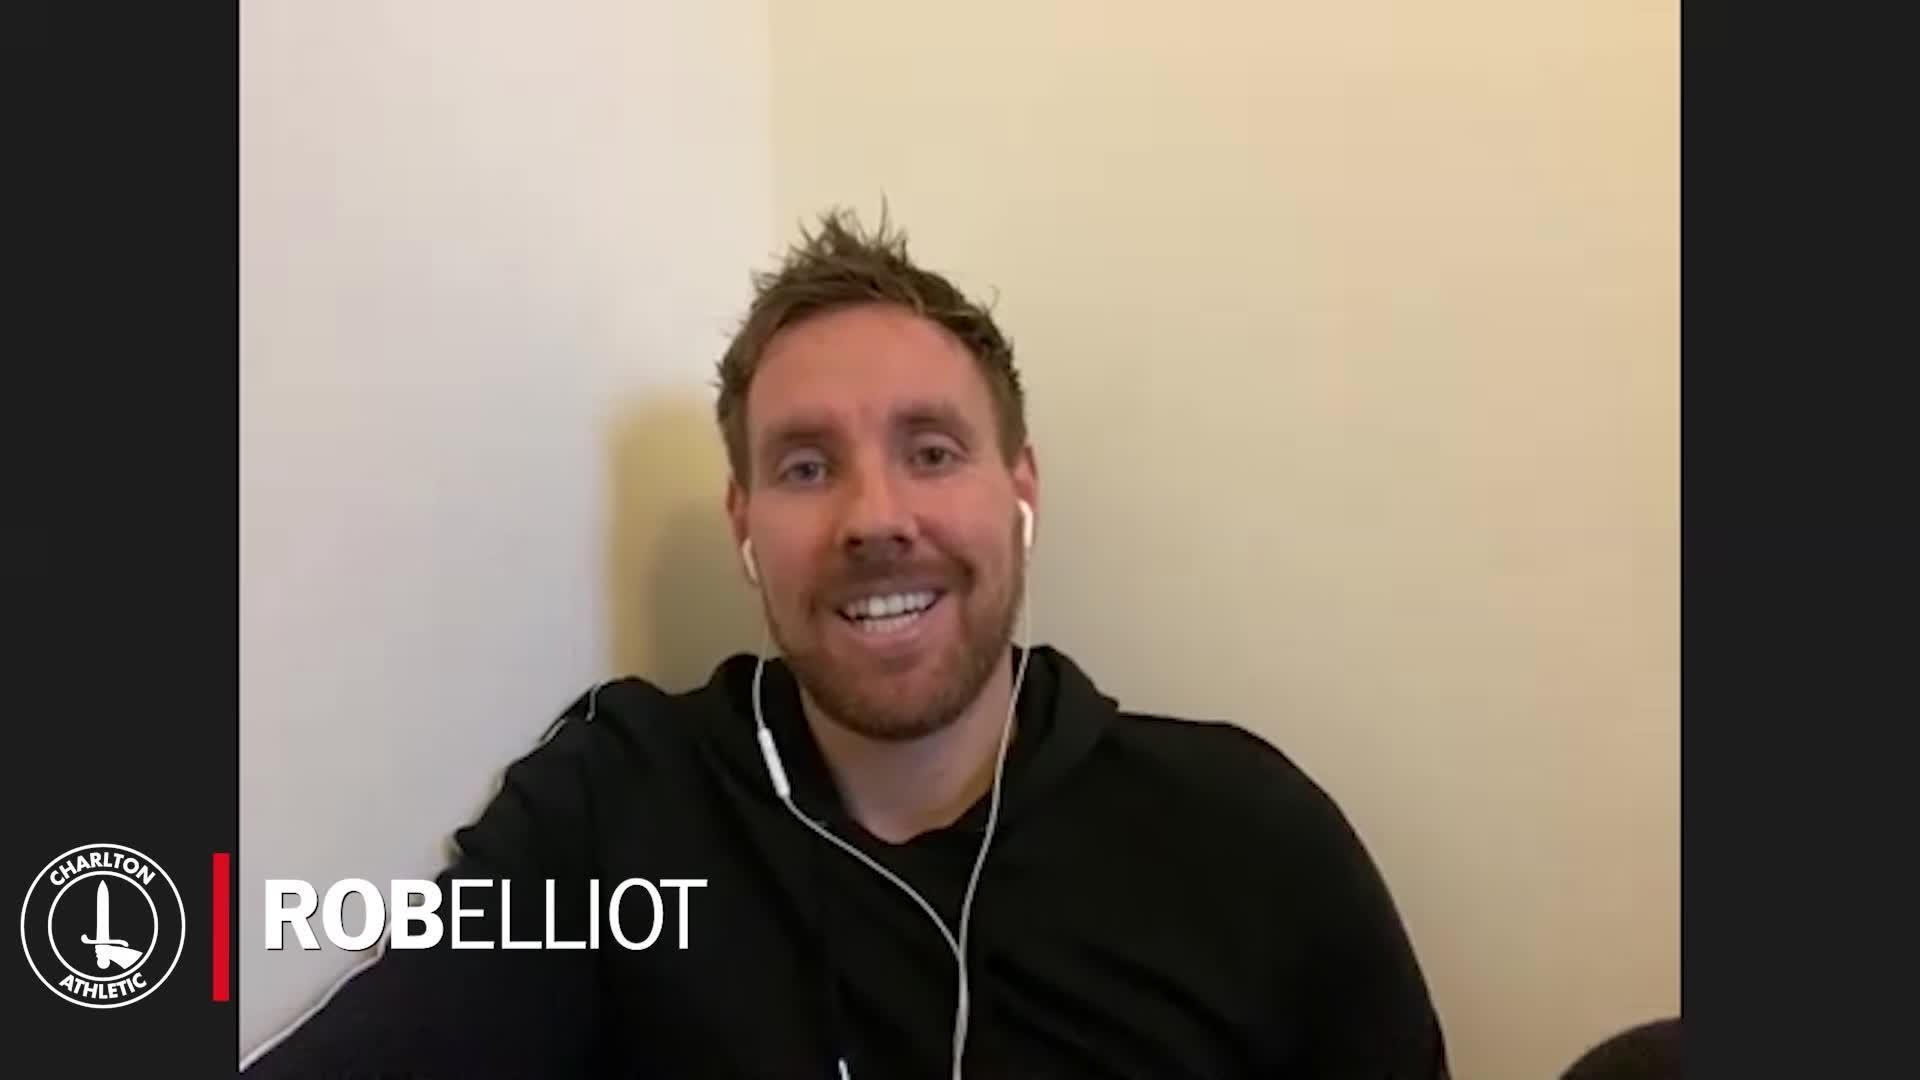 Rob Elliot on his return to Sparrows Lane (December 2020)